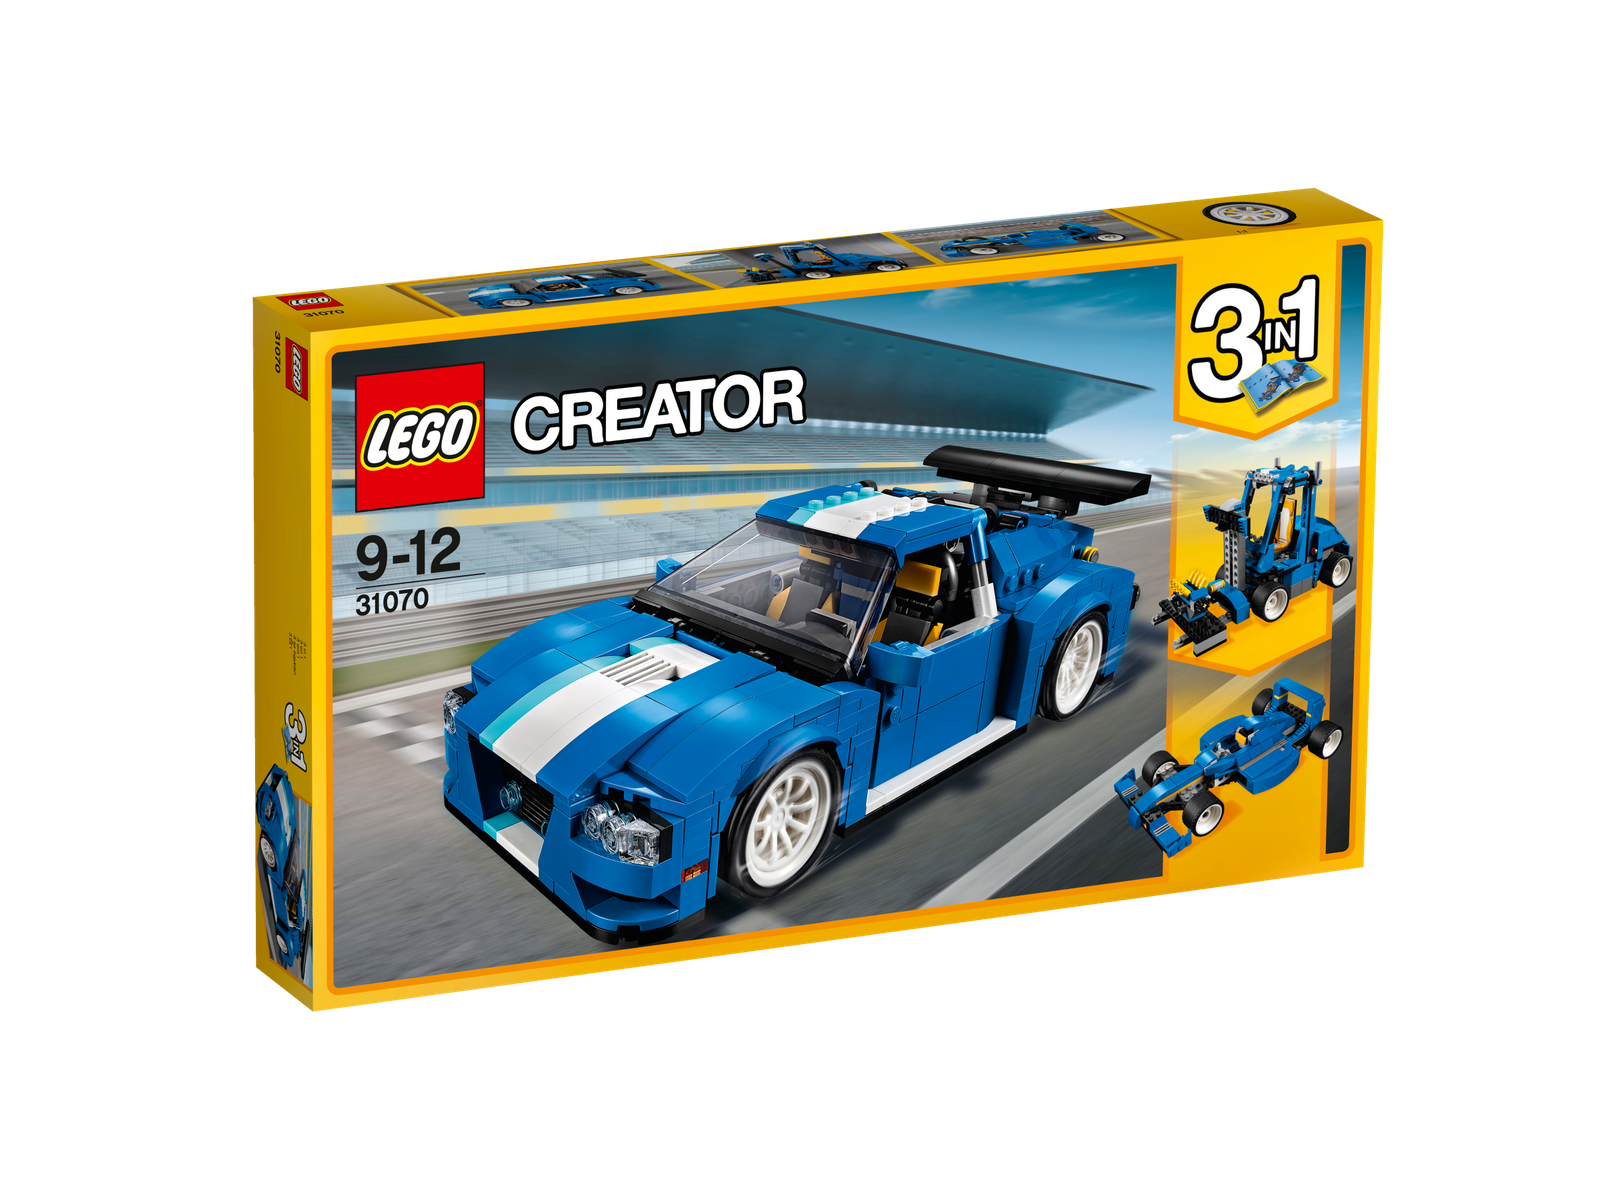 LEGO® Creator 31070 Turborennwagen NEU OVP_ Turbo Track Racer NEW MISB NRFB